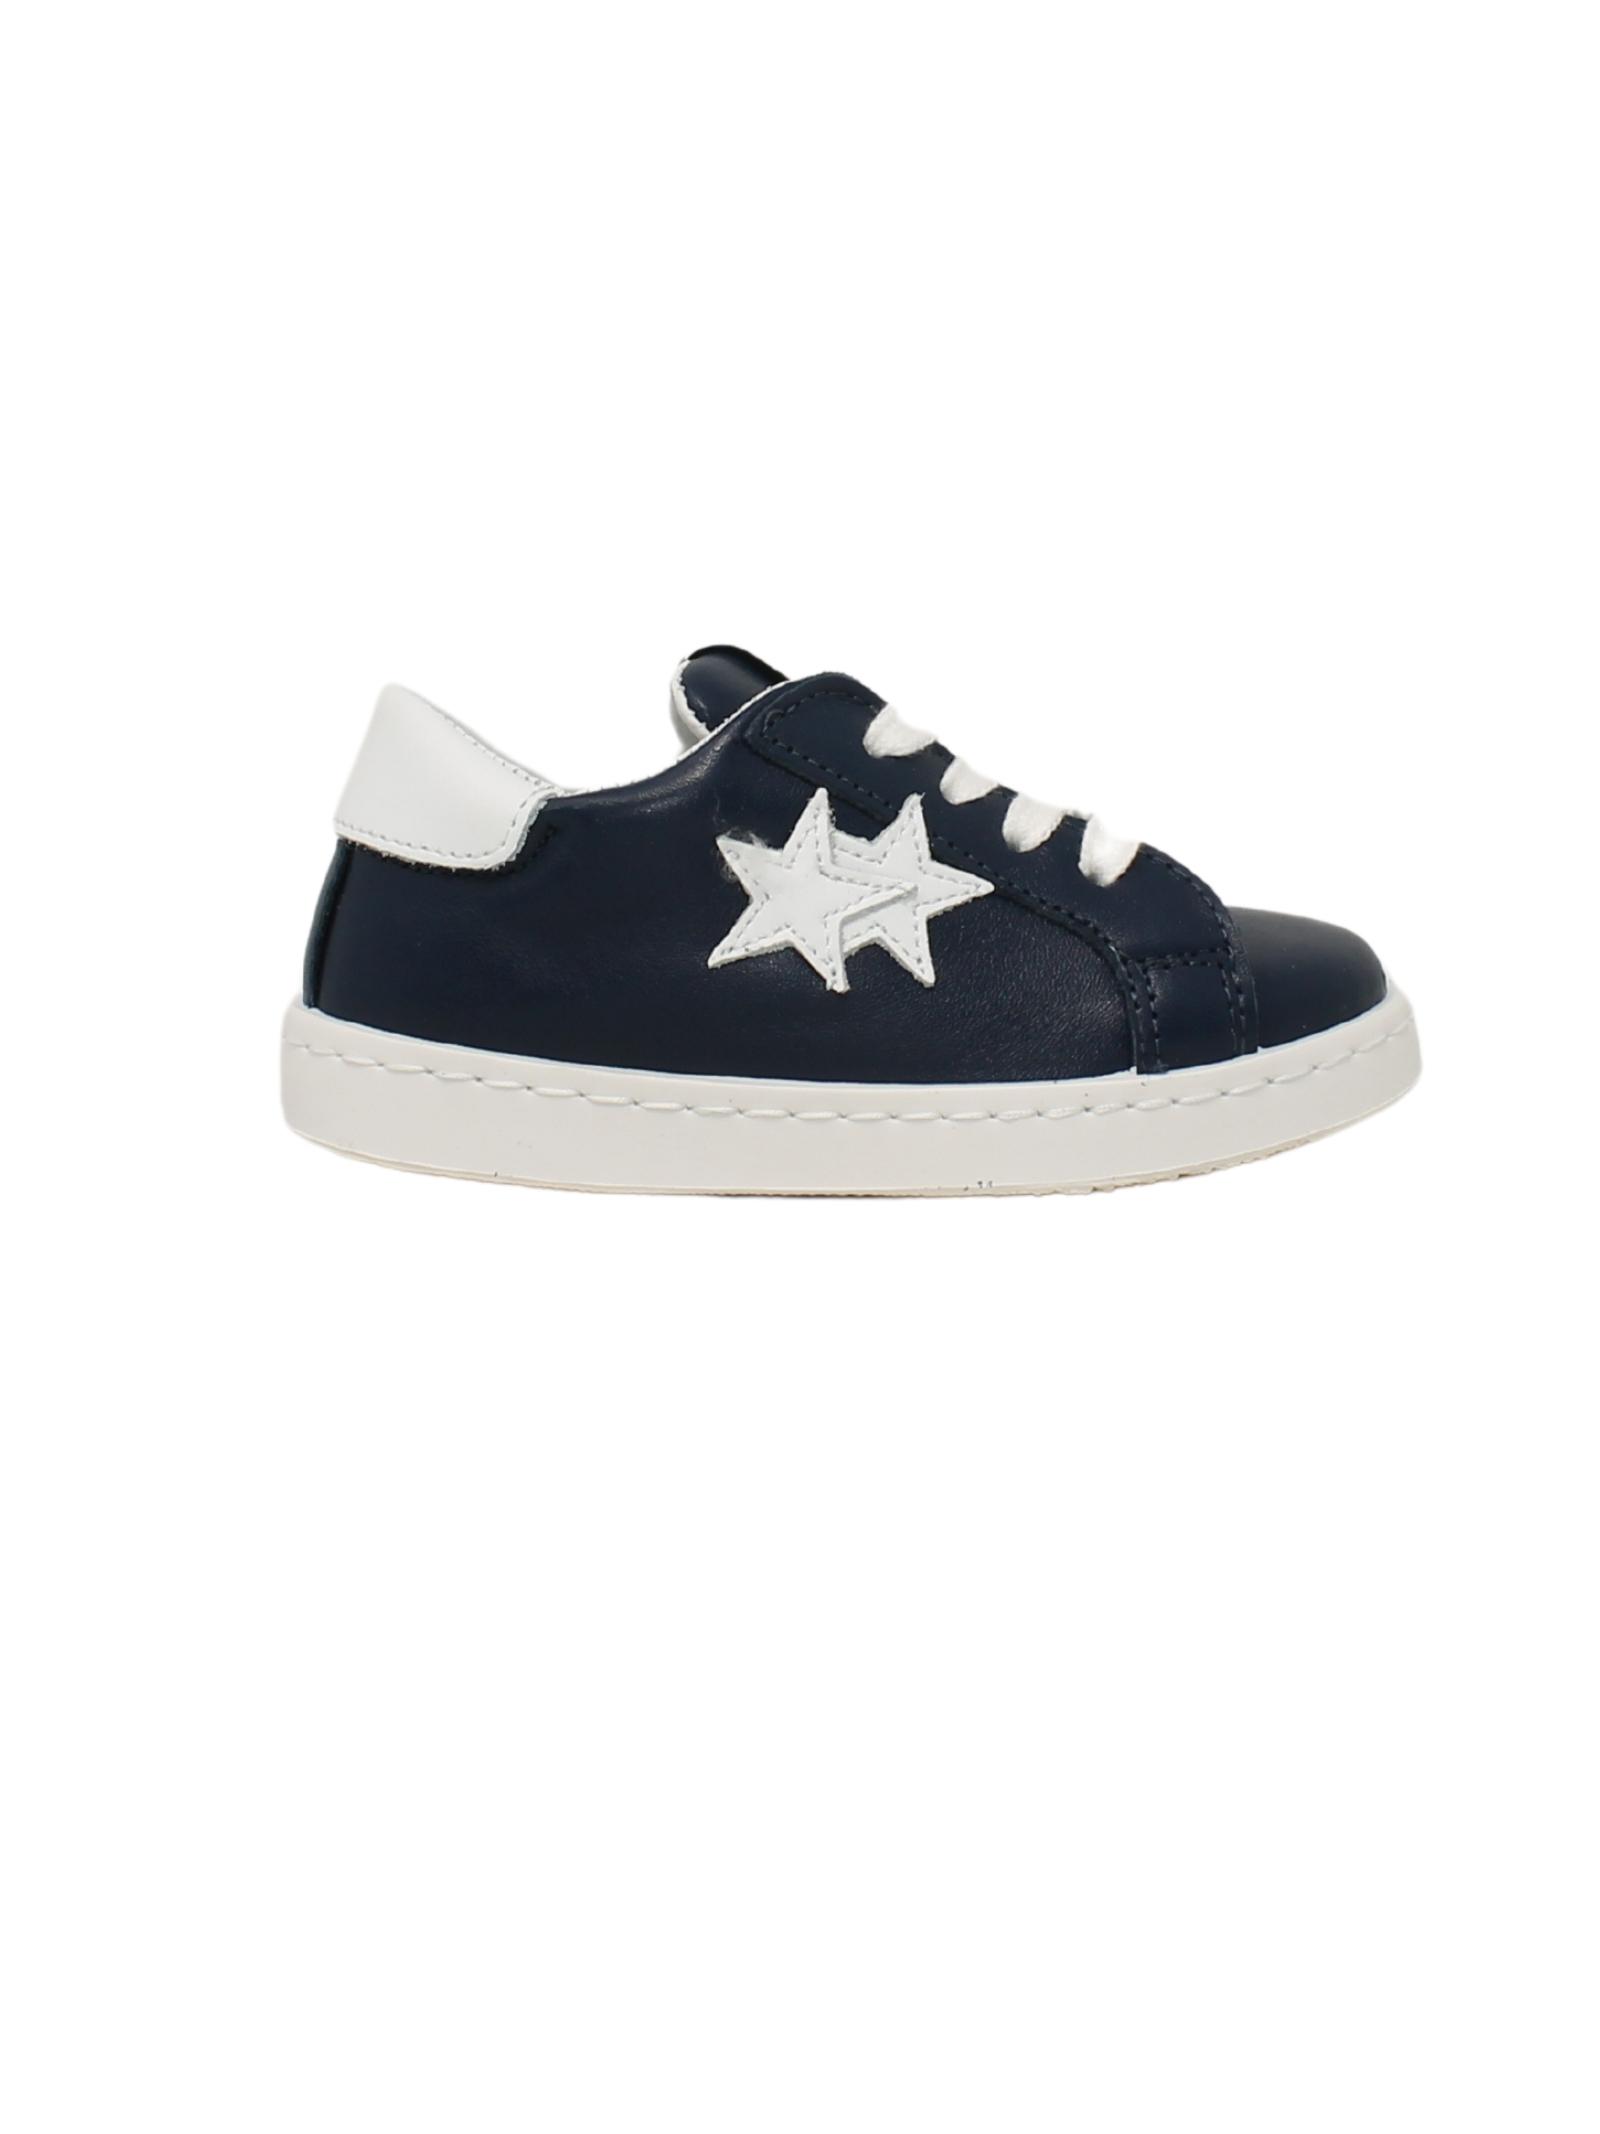 Sneakers Low Blu White Bambino 2STAR KIDS | Sneakers | 2BB2210BLU/BIANCO